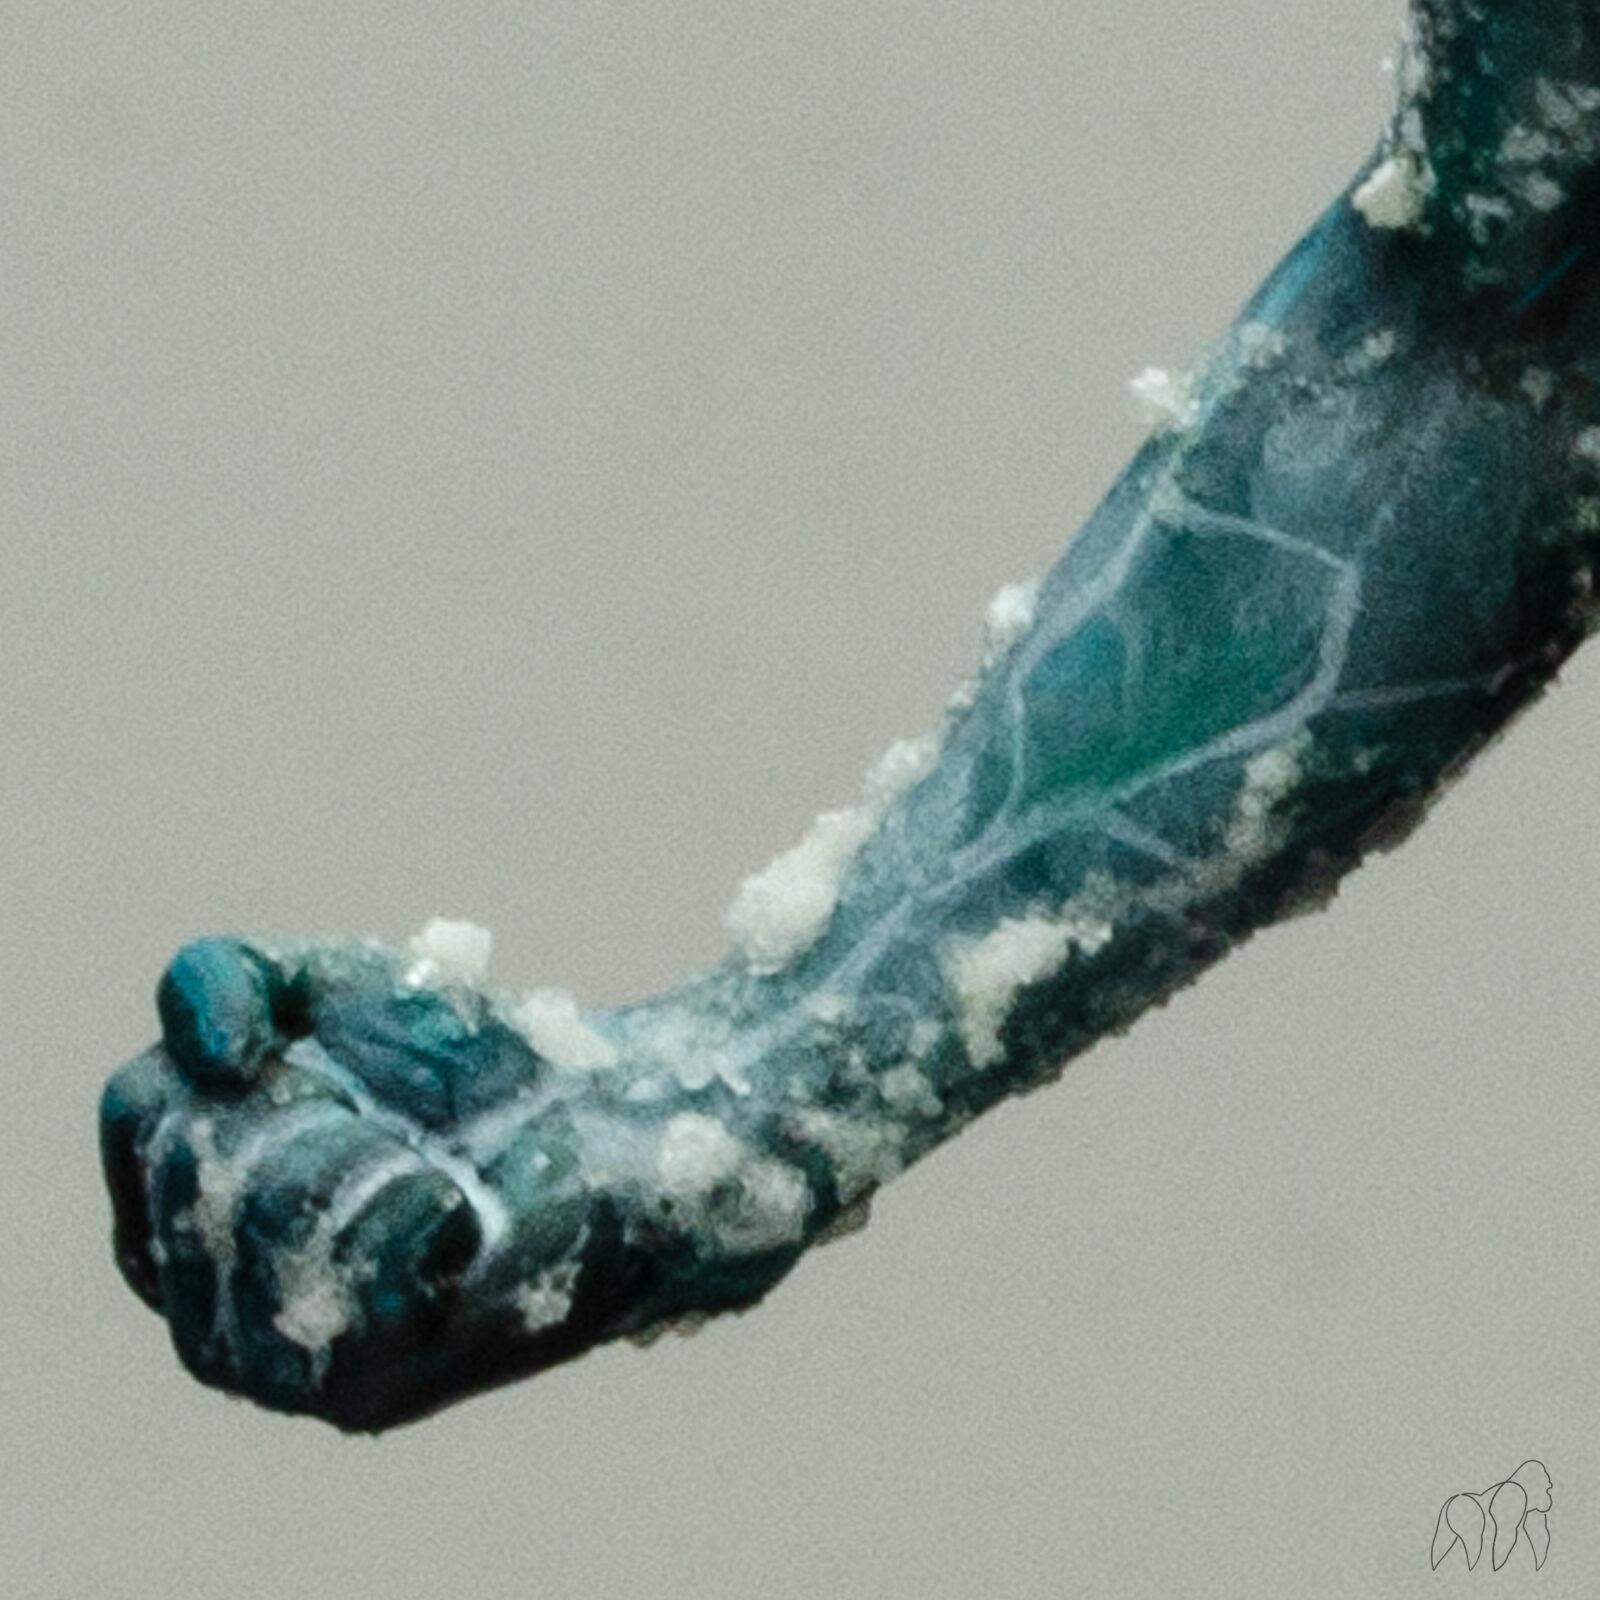 Iceboy03